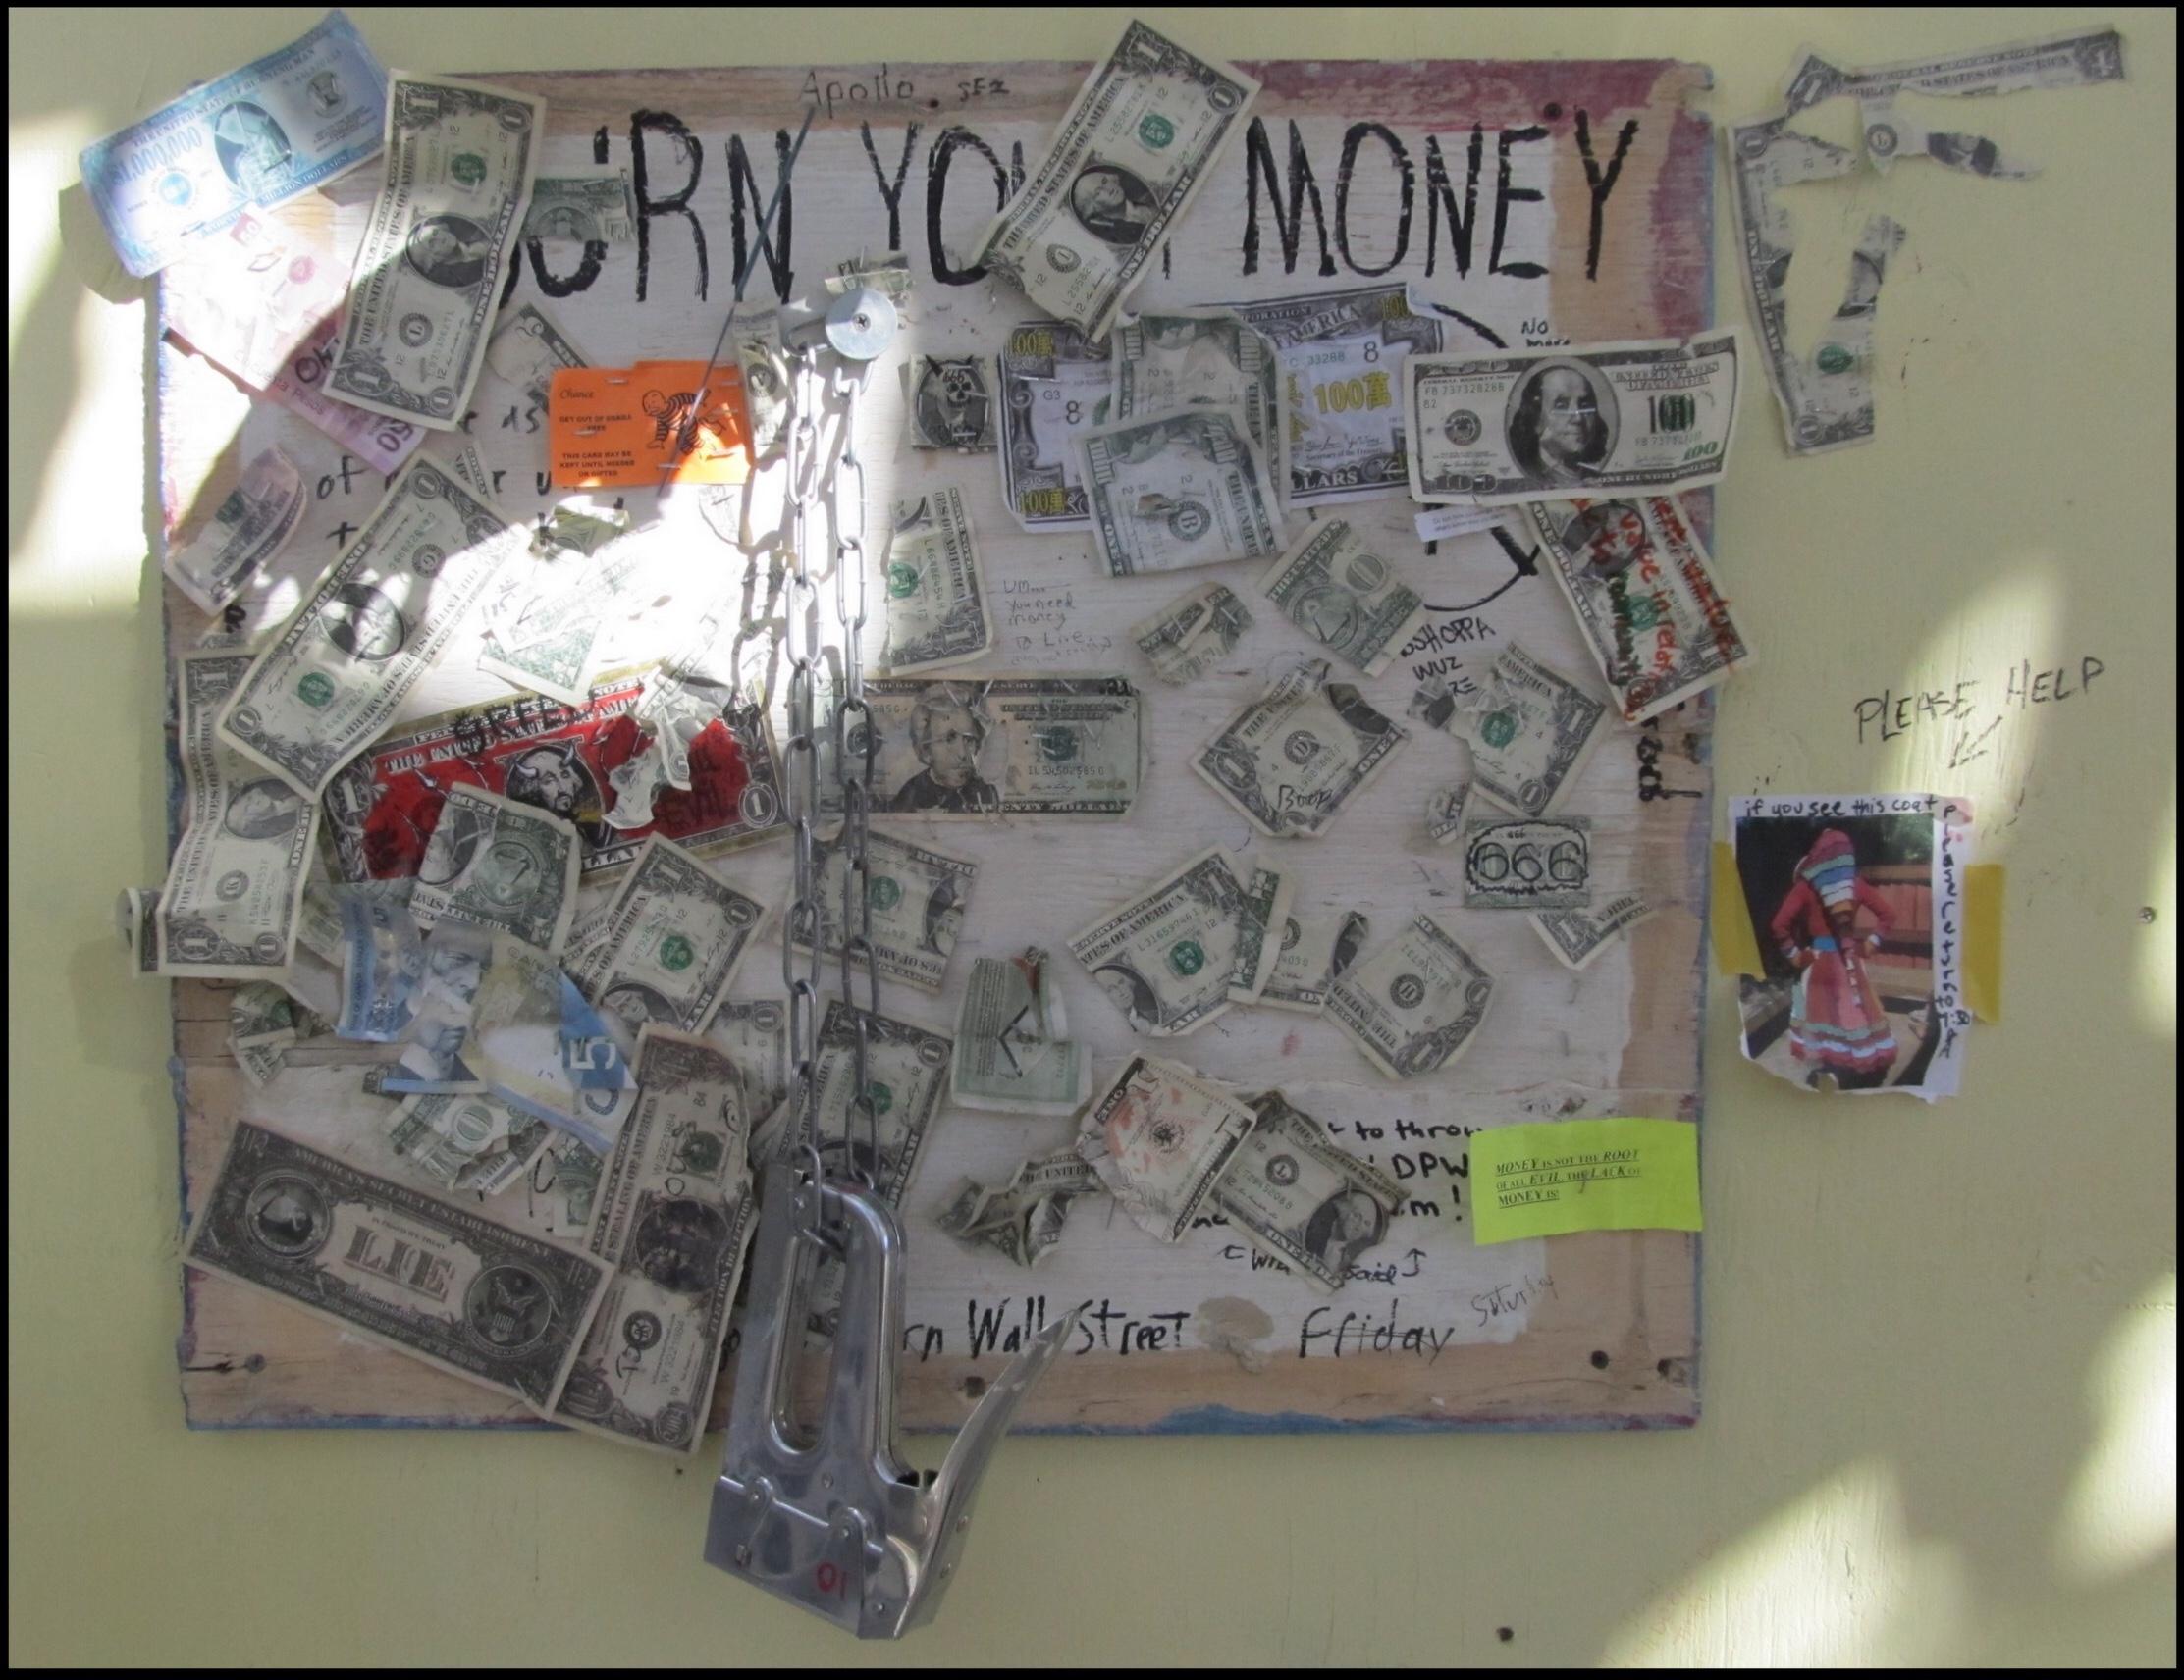 2d420eed9fe4 Money burning - Wikipedia